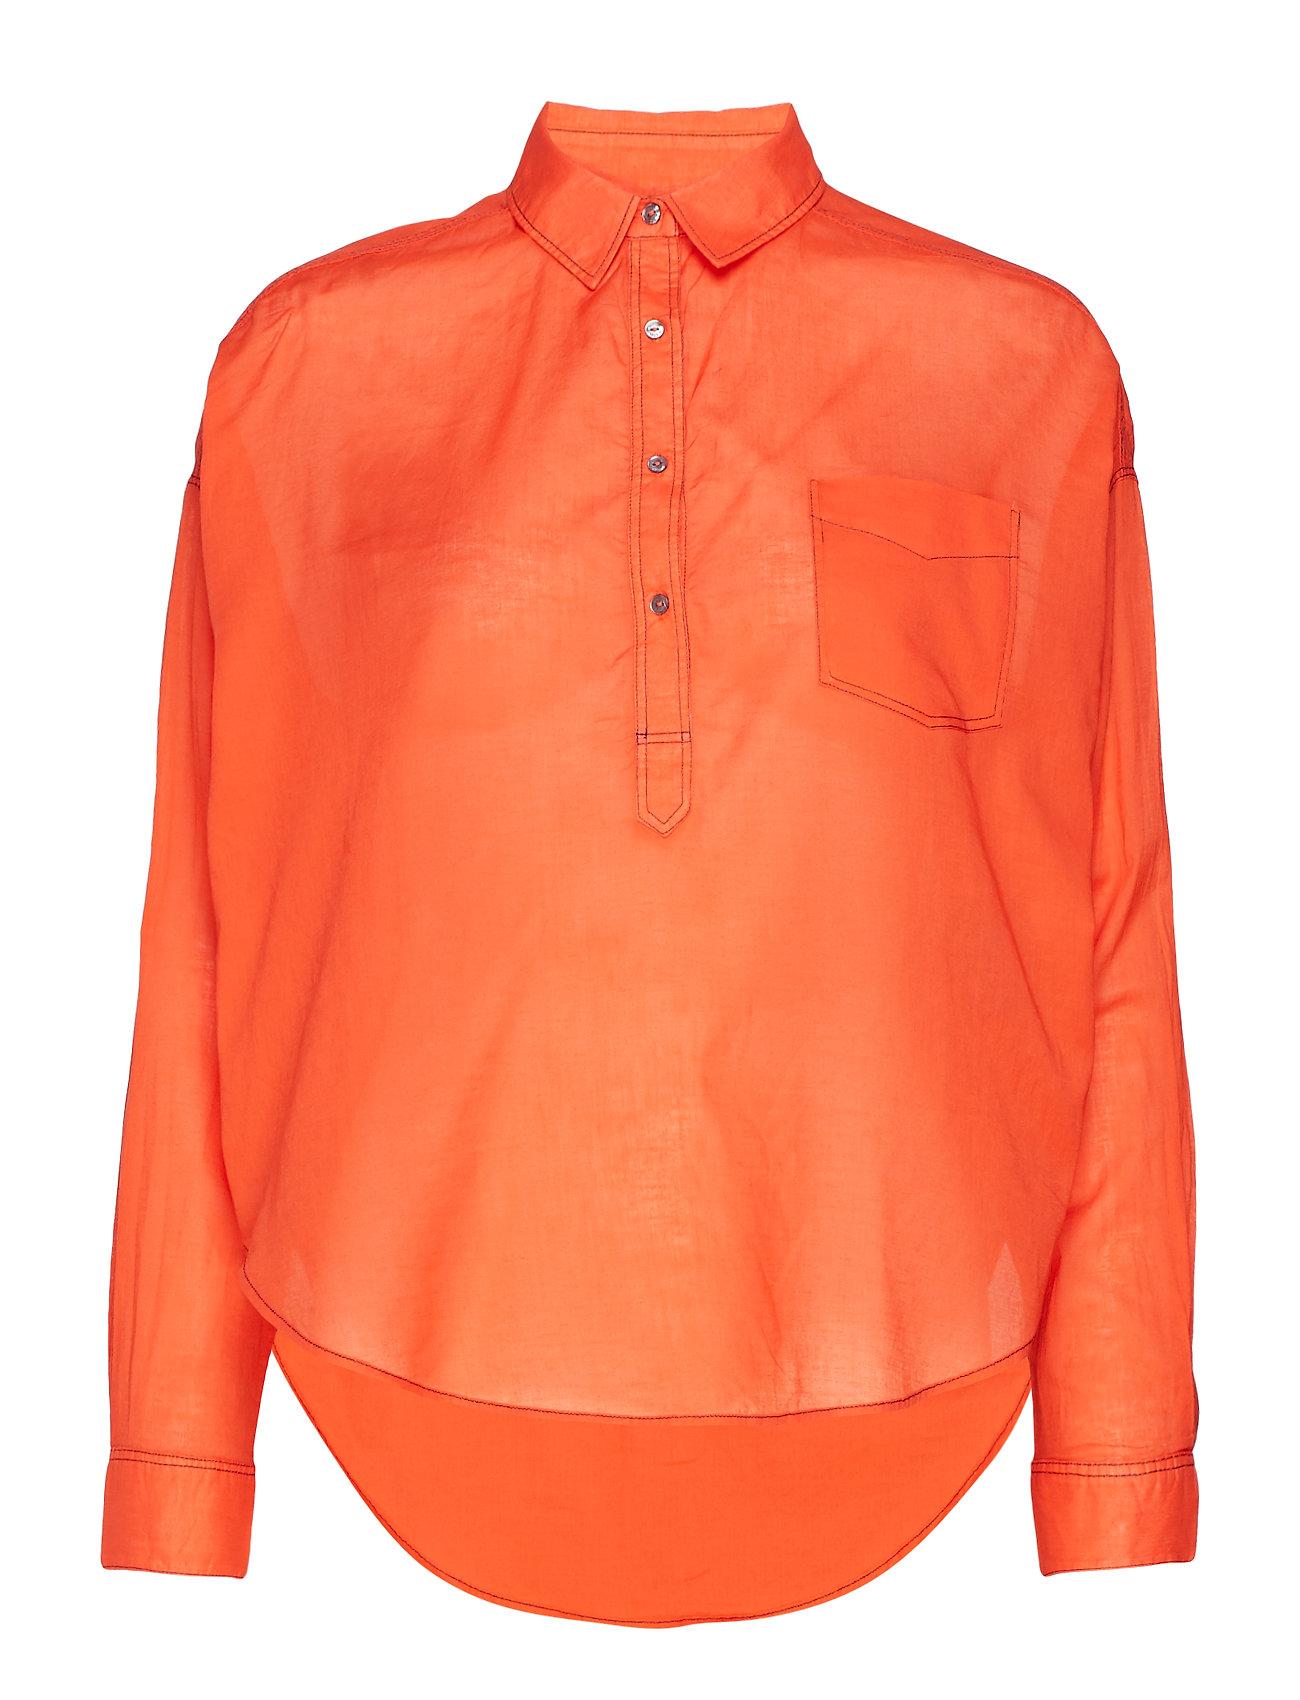 Scotch & Soda Light weight cotton shirt - SUNSET ORANGE